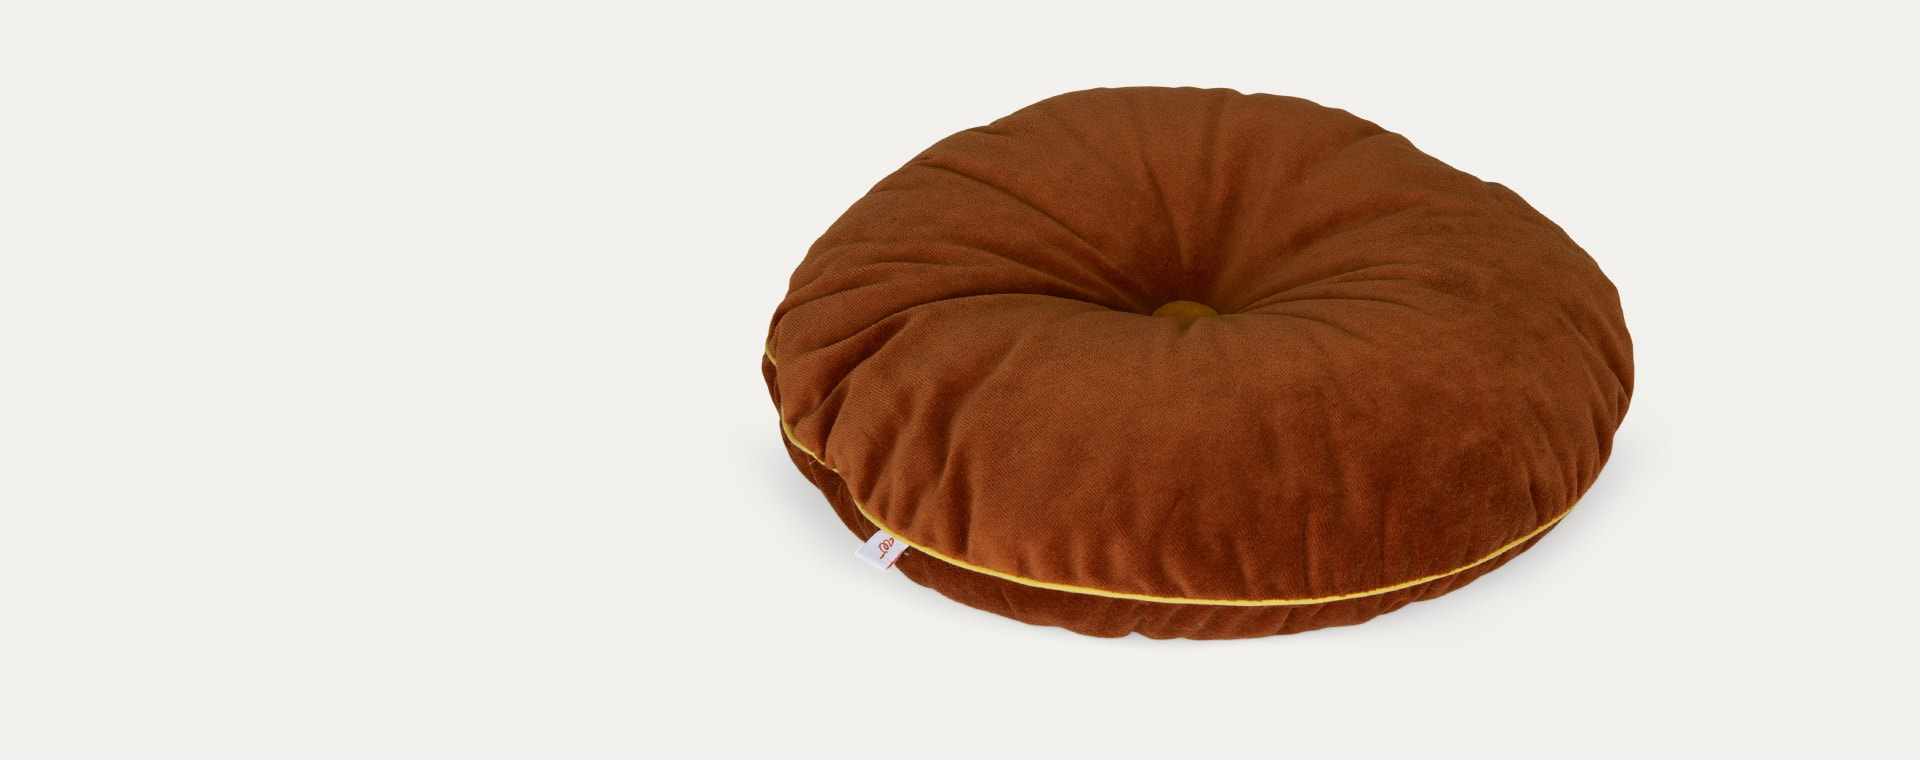 Cinnamon/Mustard wigiwama Round Button Cushion